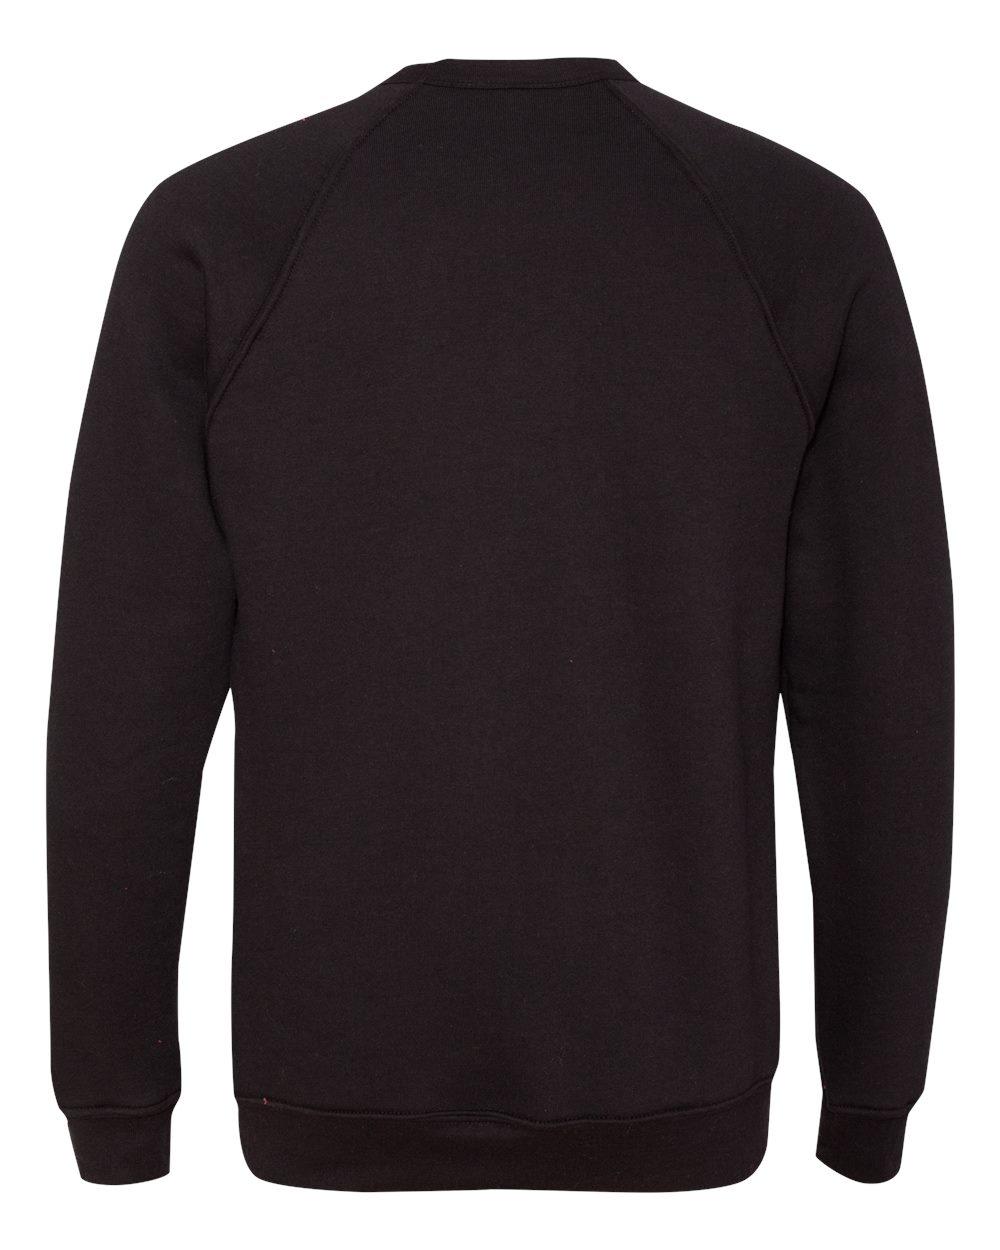 Bella-Canvas-Unisex-Sponge-Fleece-Crewneck-Sweatshirt-Top-Blank-3901-up-to-2XL thumbnail 12